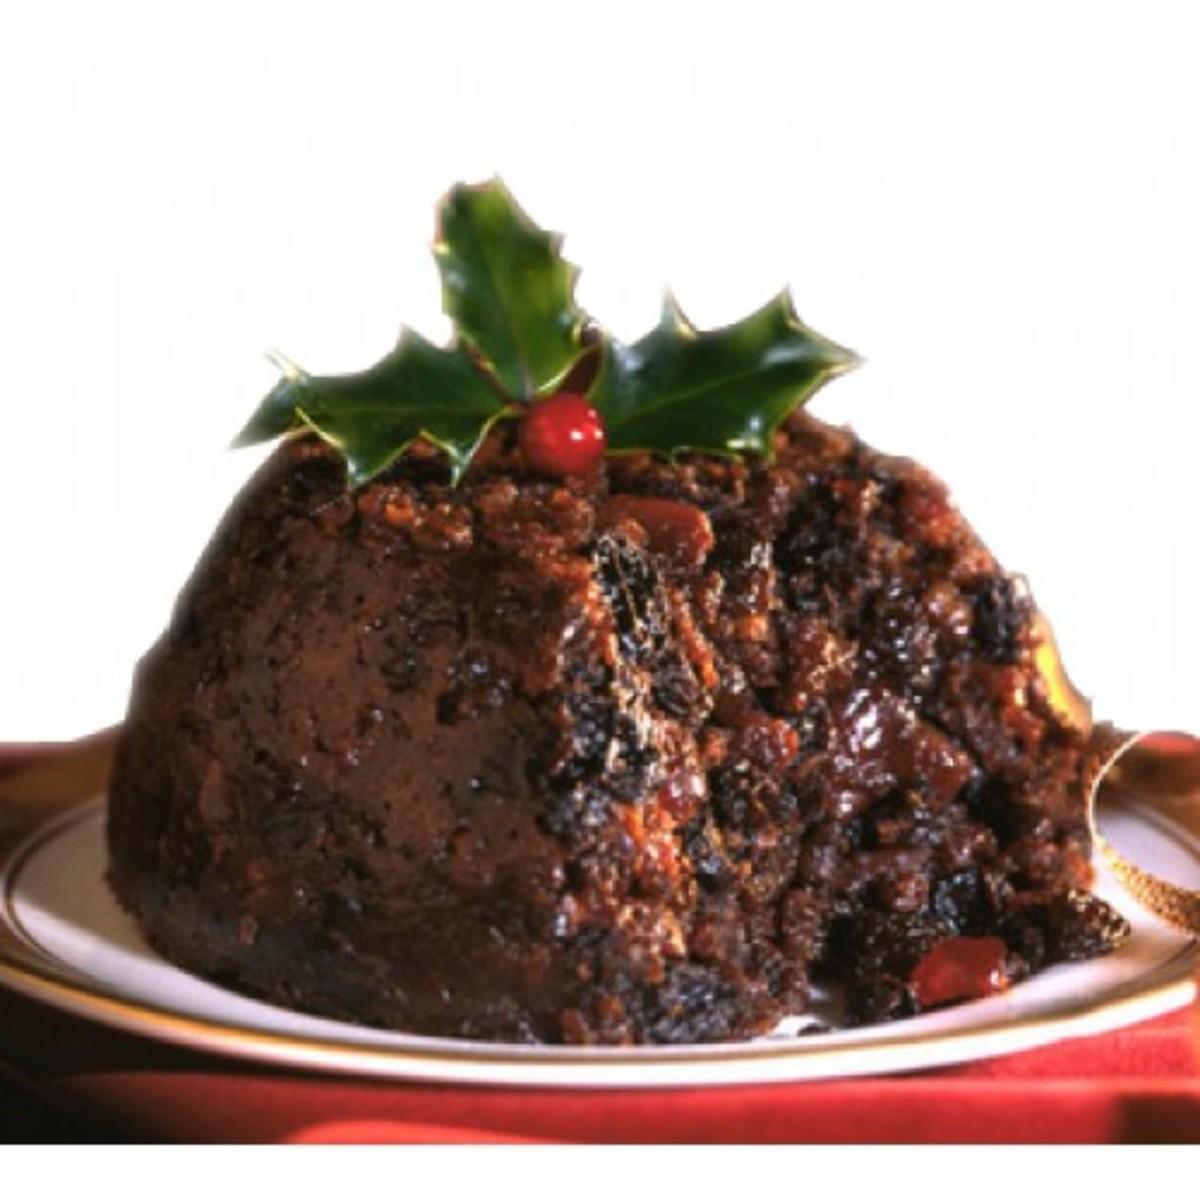 A standard modern Christmas pudding